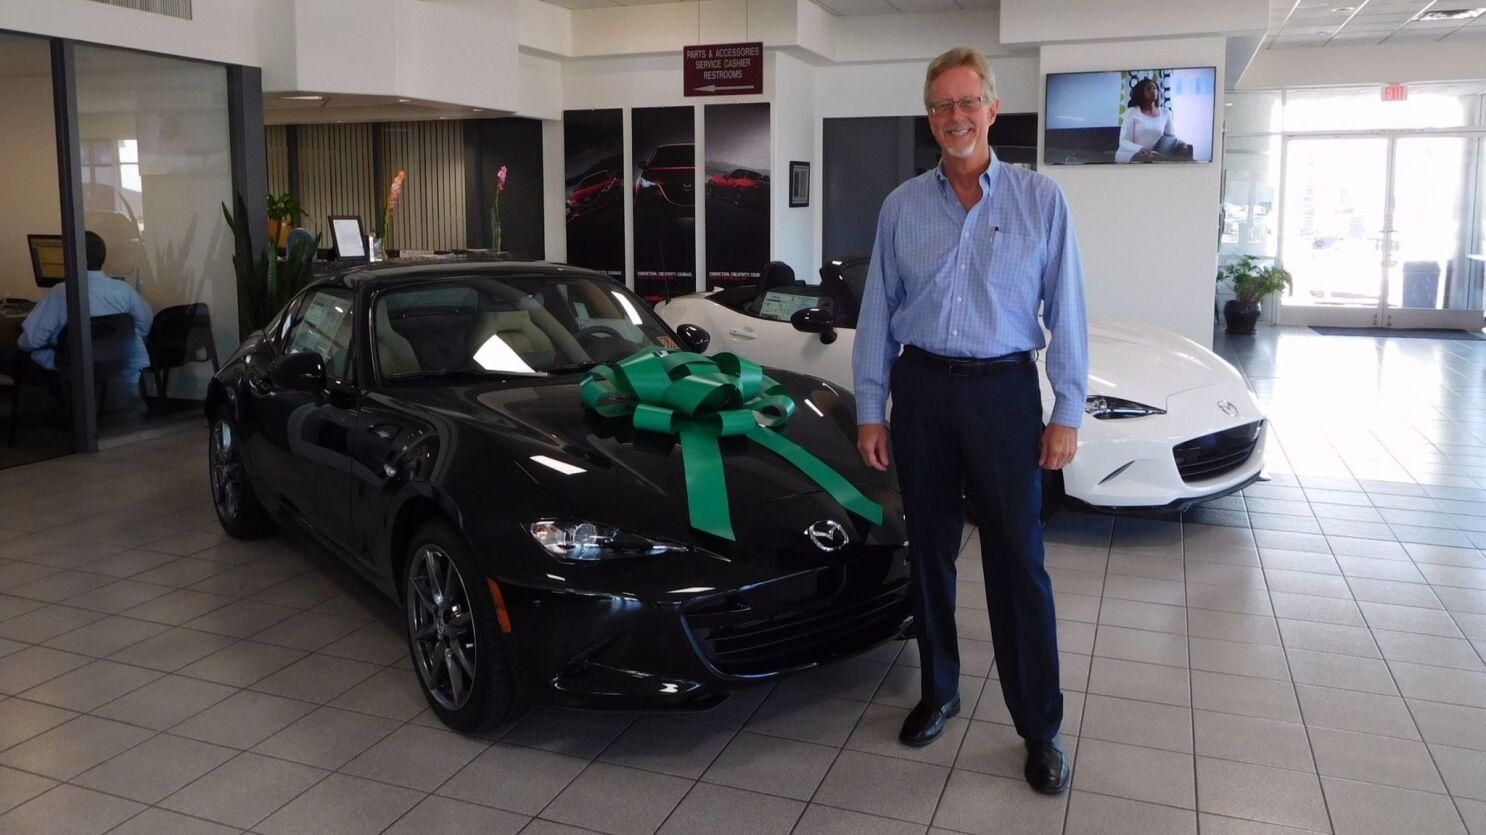 Mazda Dealership San Diego >> John Hine Dealership Celebrates 60 Years In San Diego 75 Years In